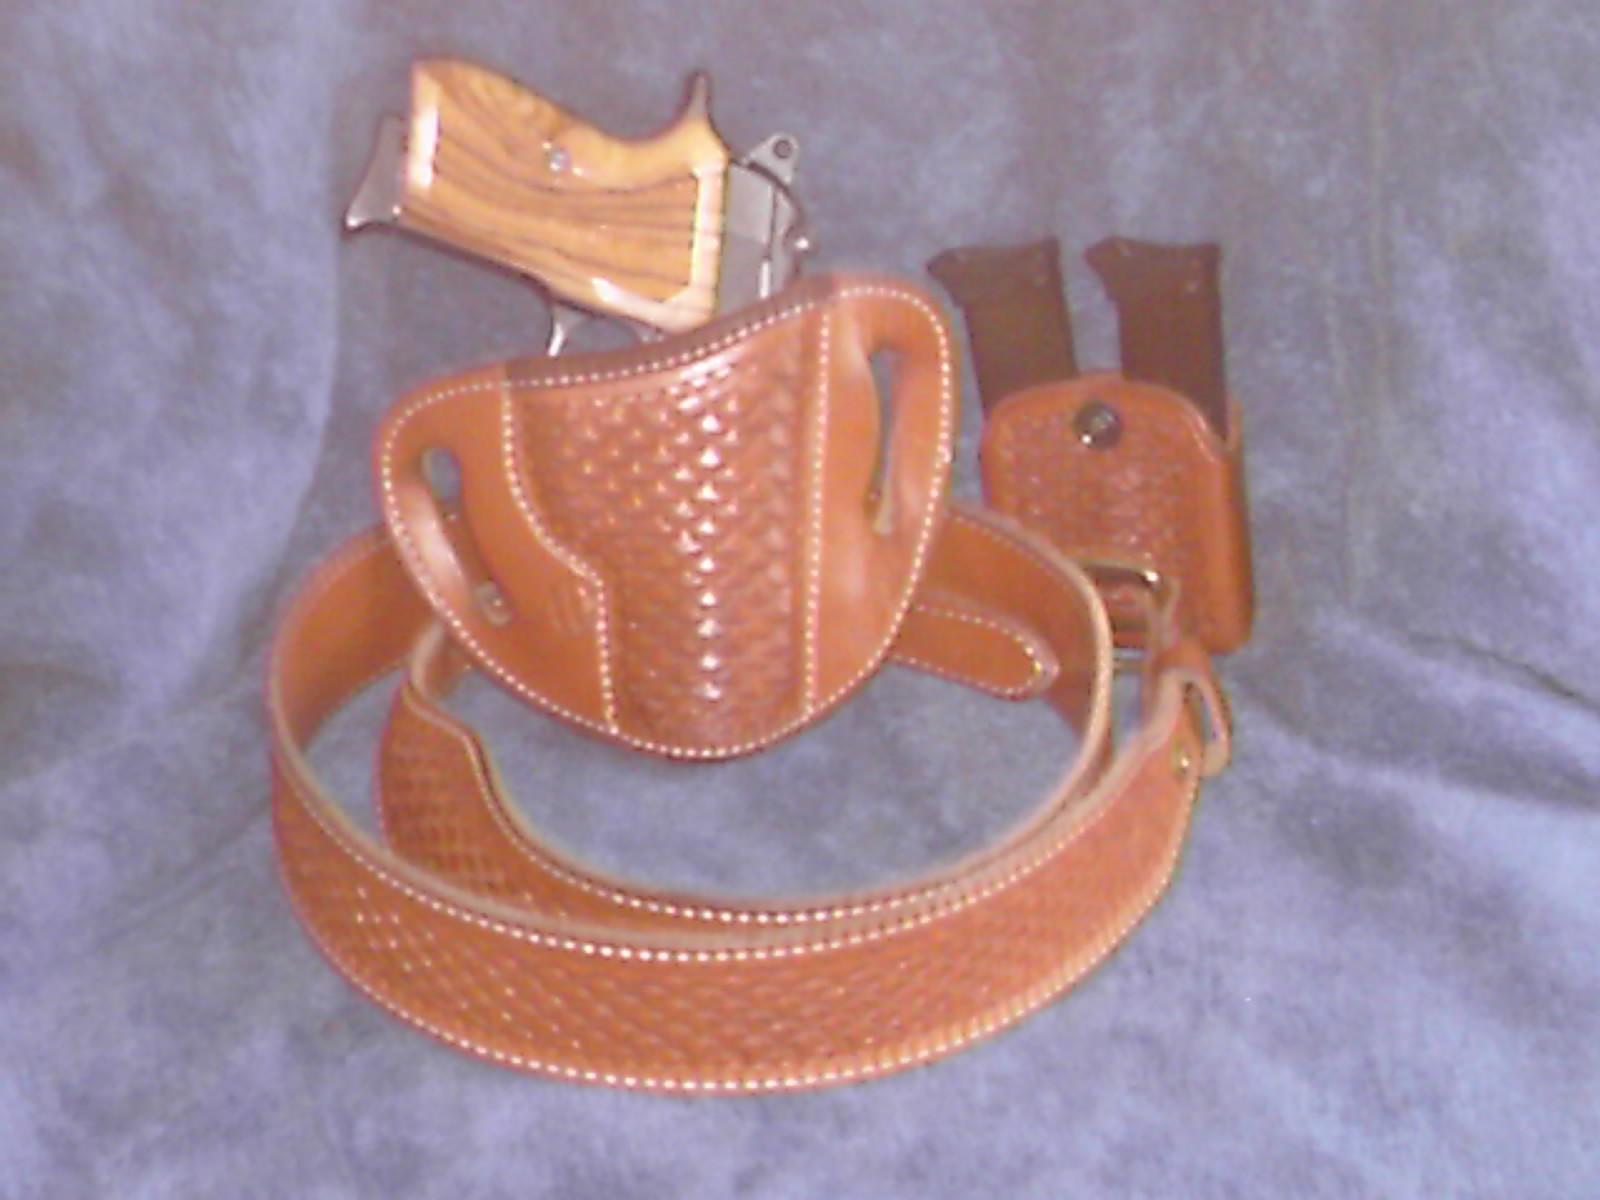 Pics of holster, belts, and guns.-bersa-rig-001.jpg